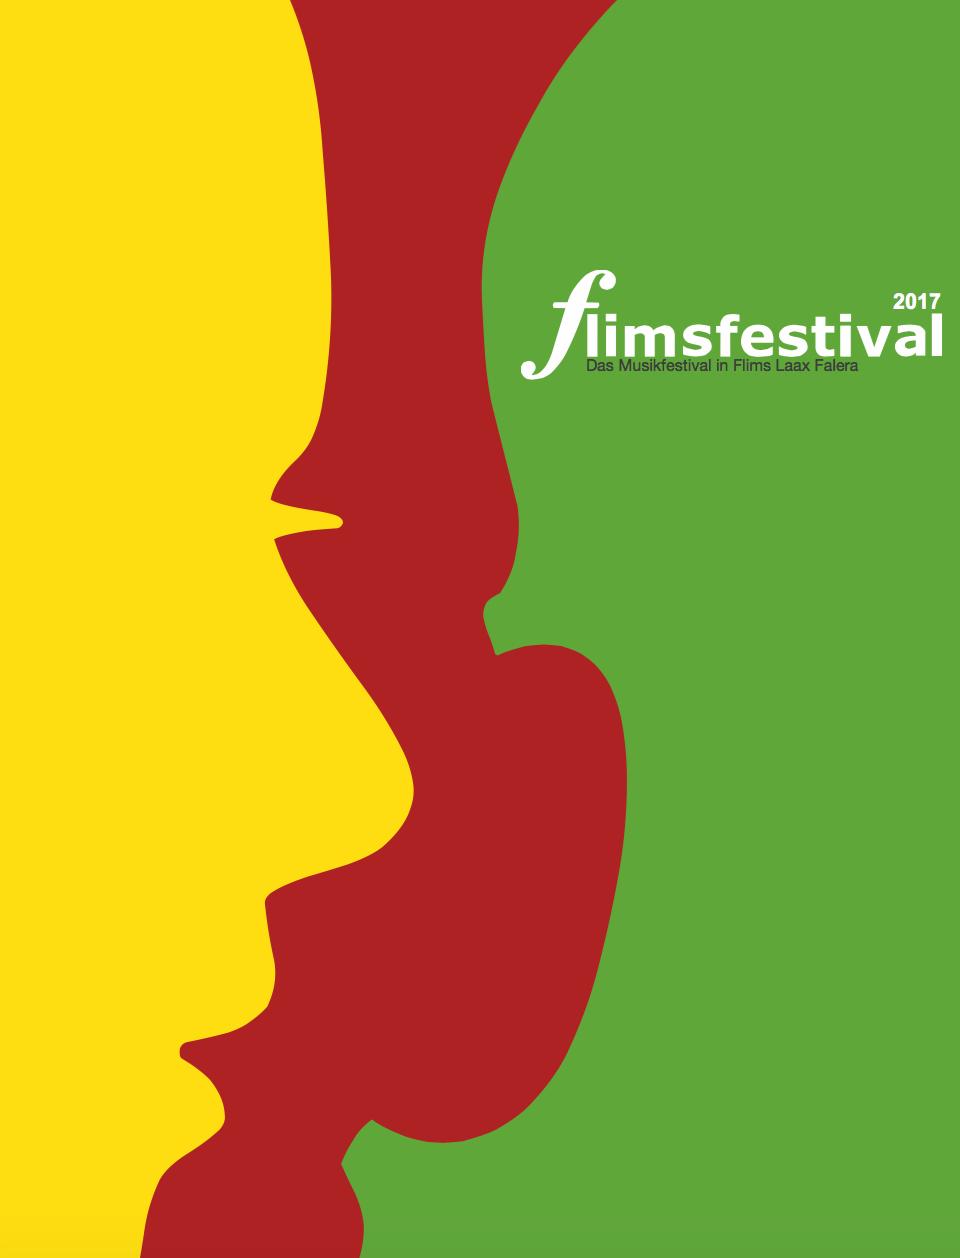 flimsfestival 2017